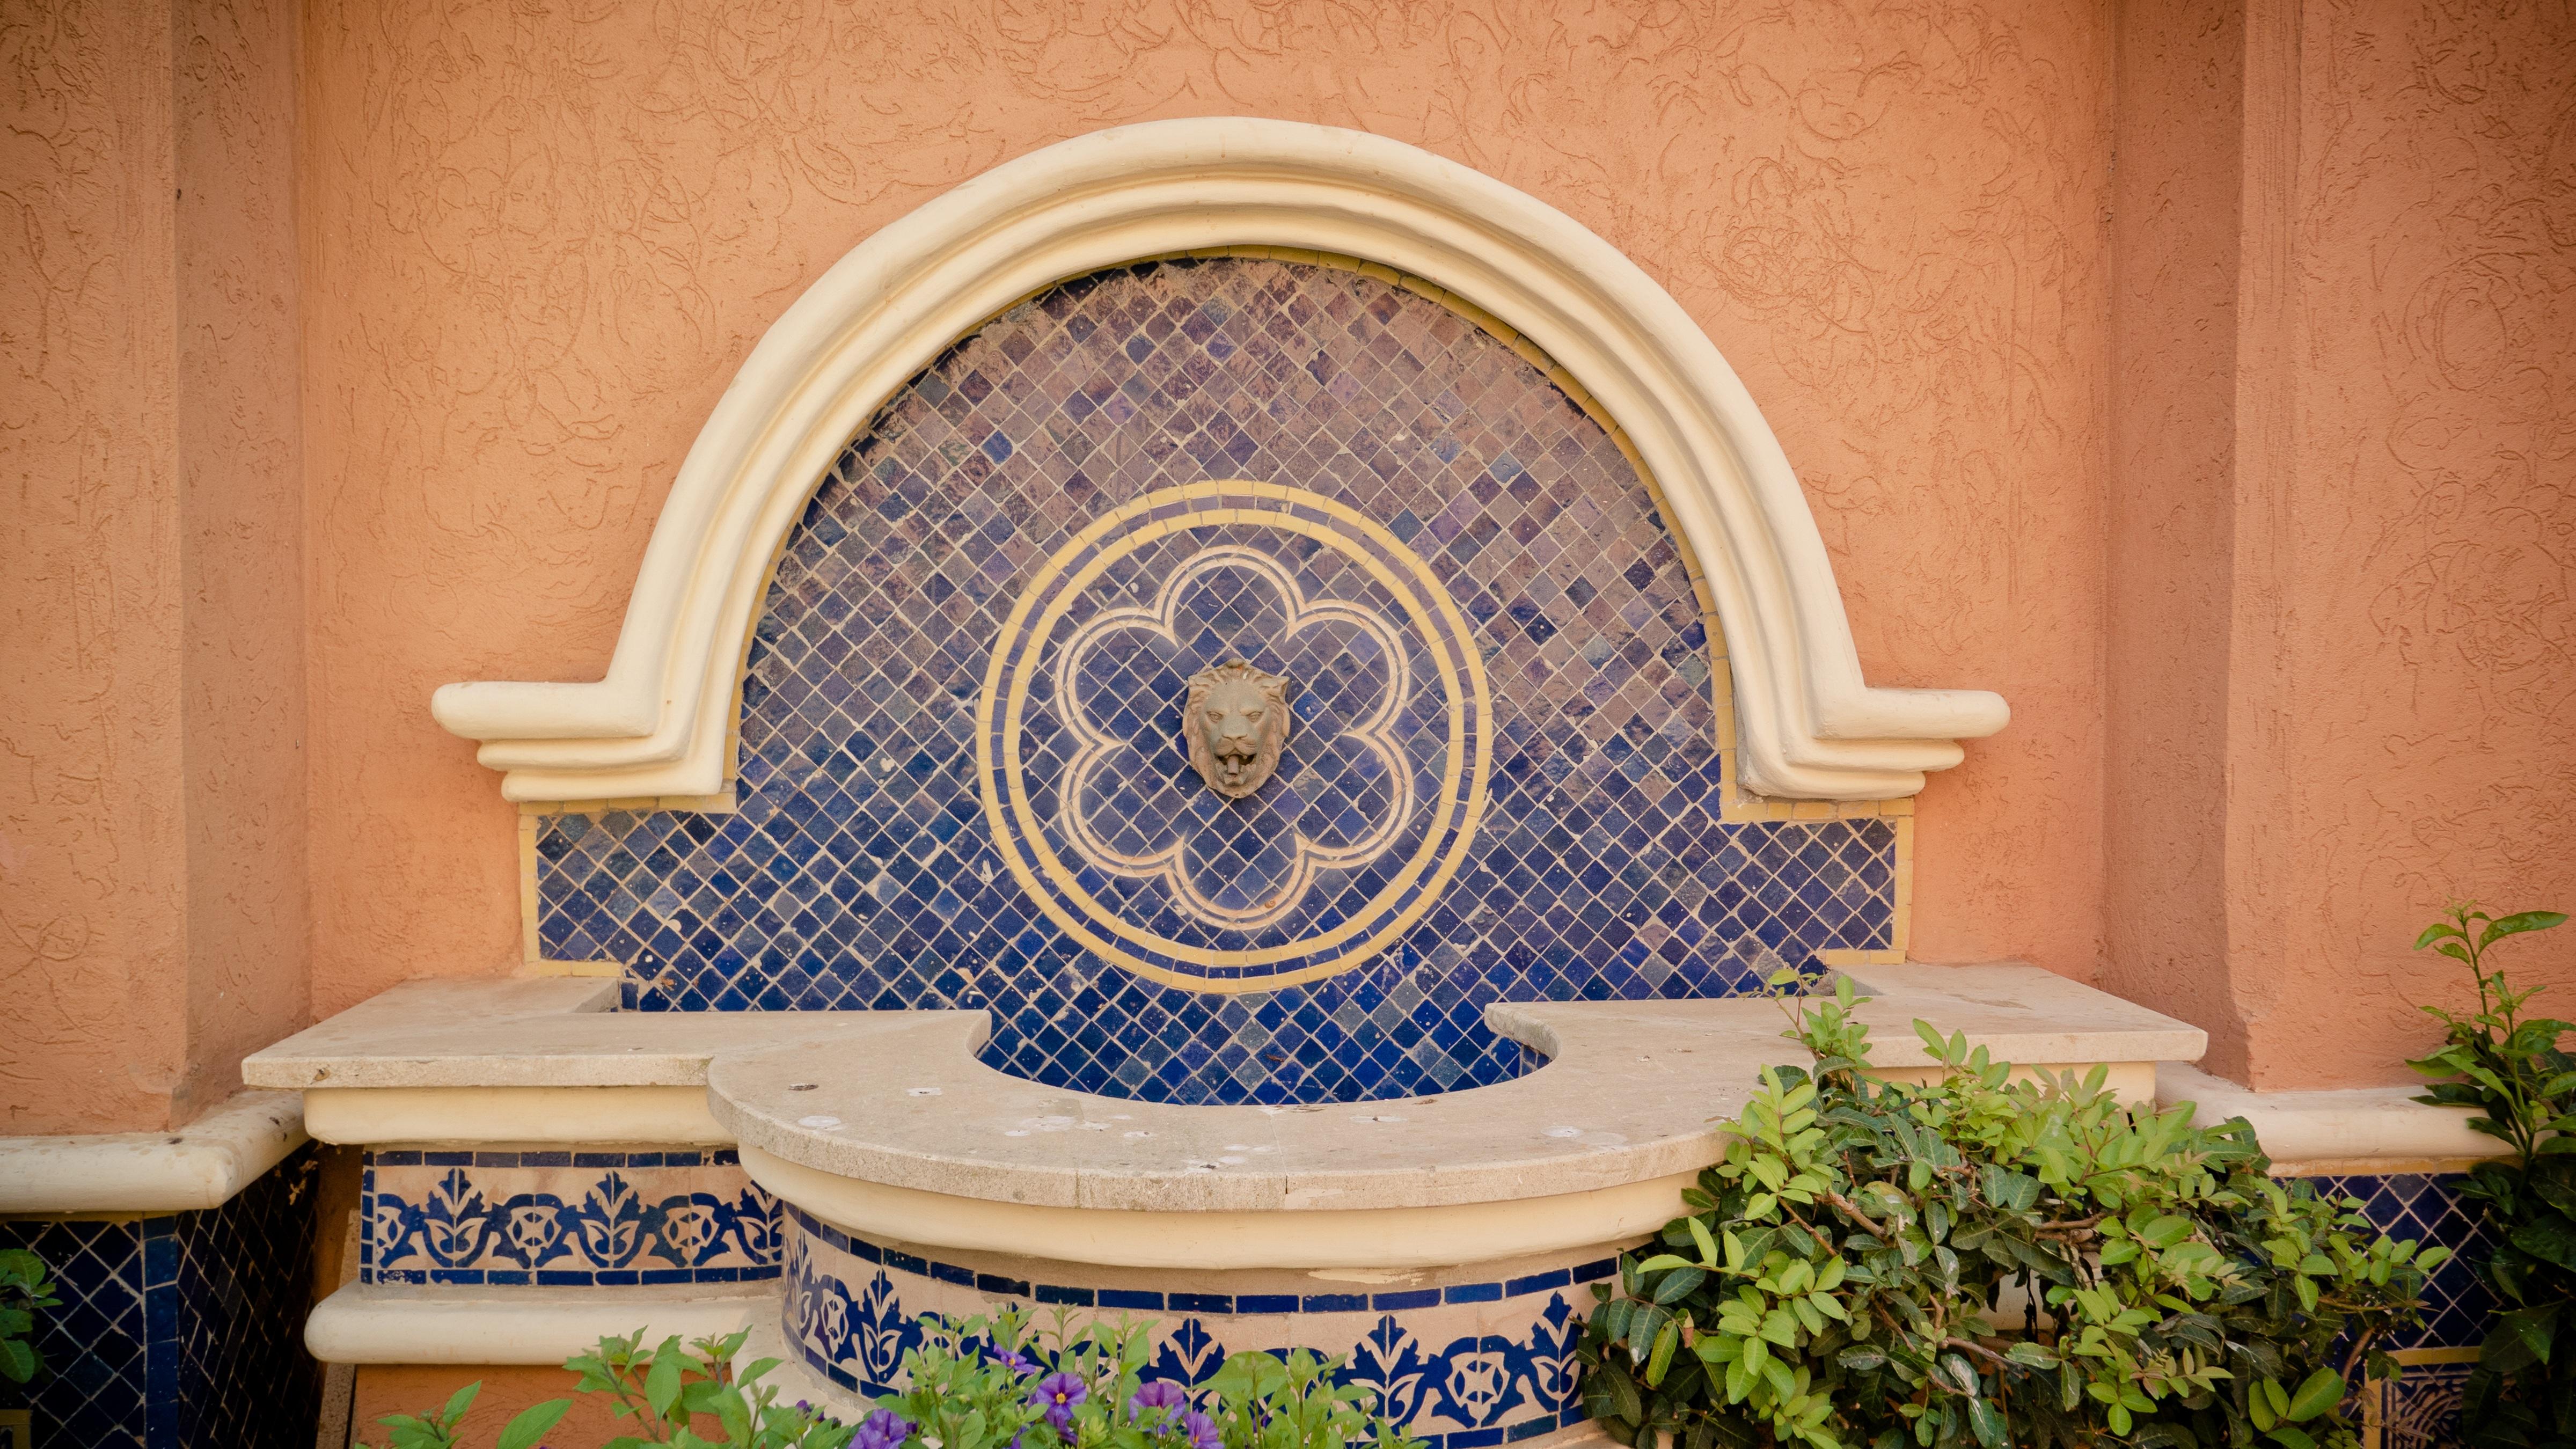 Fuentes interiores decorativas affordable fuente de agua - Fuentes decorativas interior ...